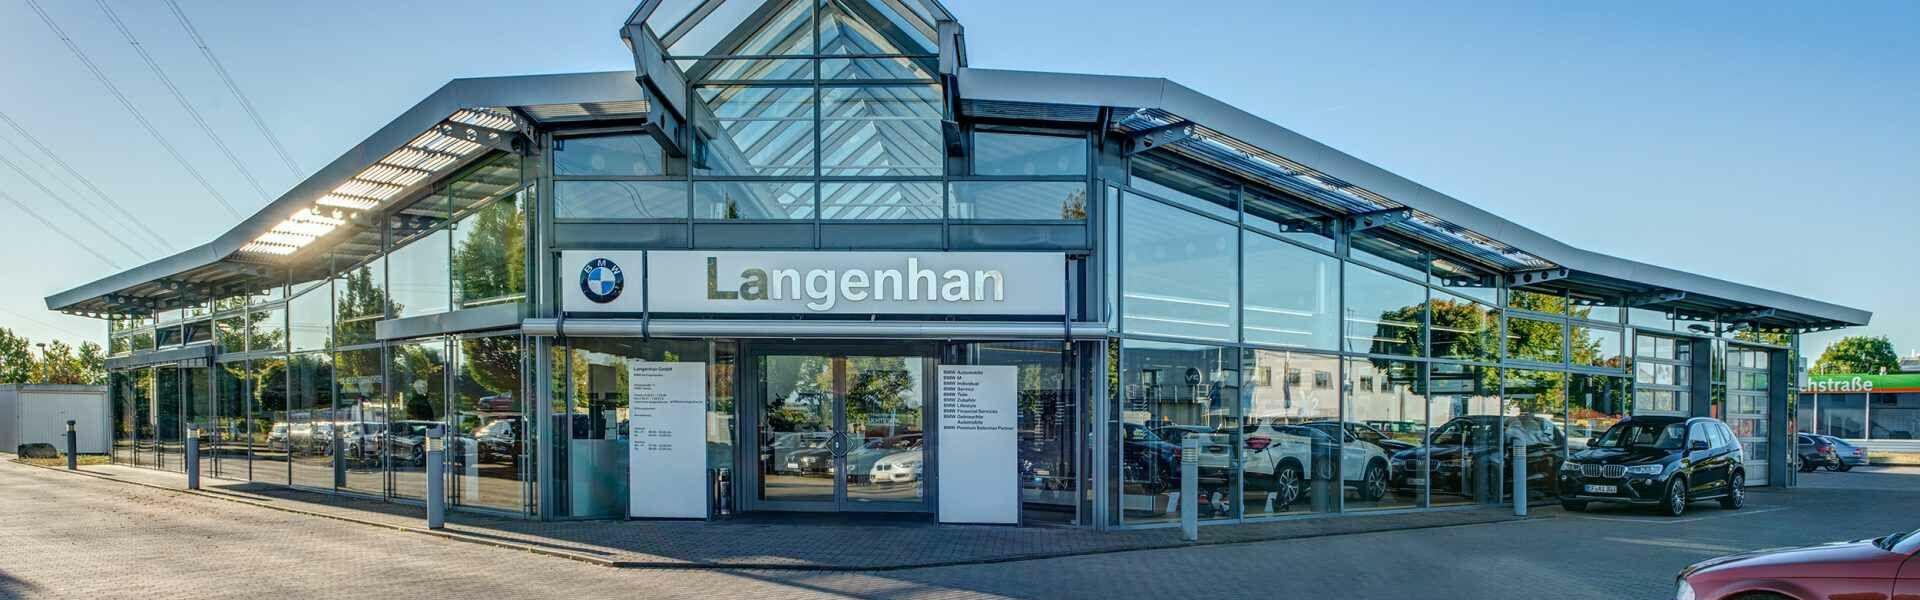 Langenhan_GTH_teaser